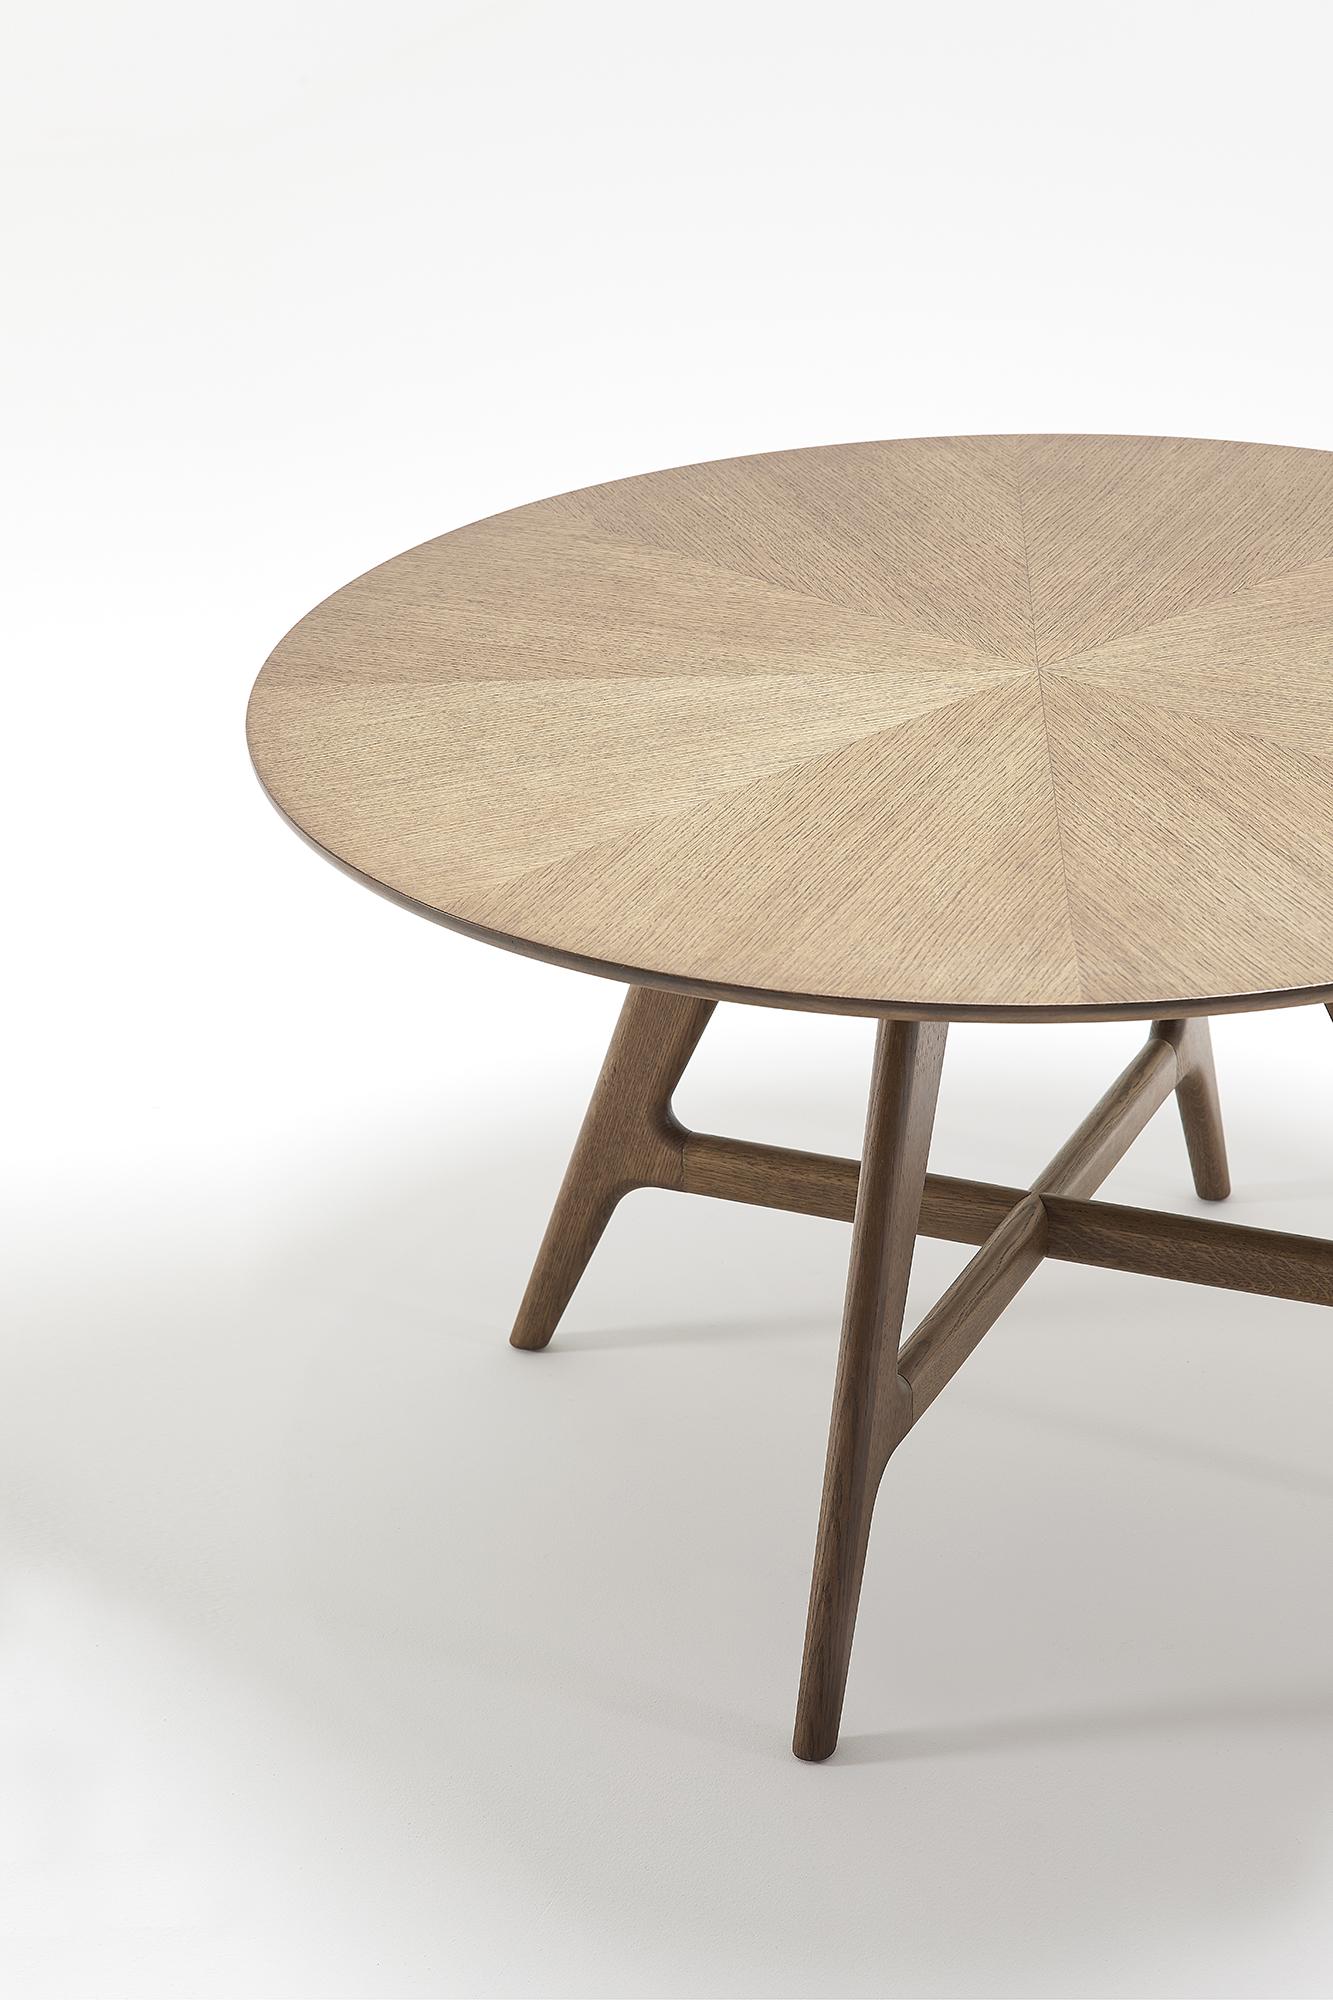 ADV_180906_J-Round-Table-Detail-0204_001.jpg